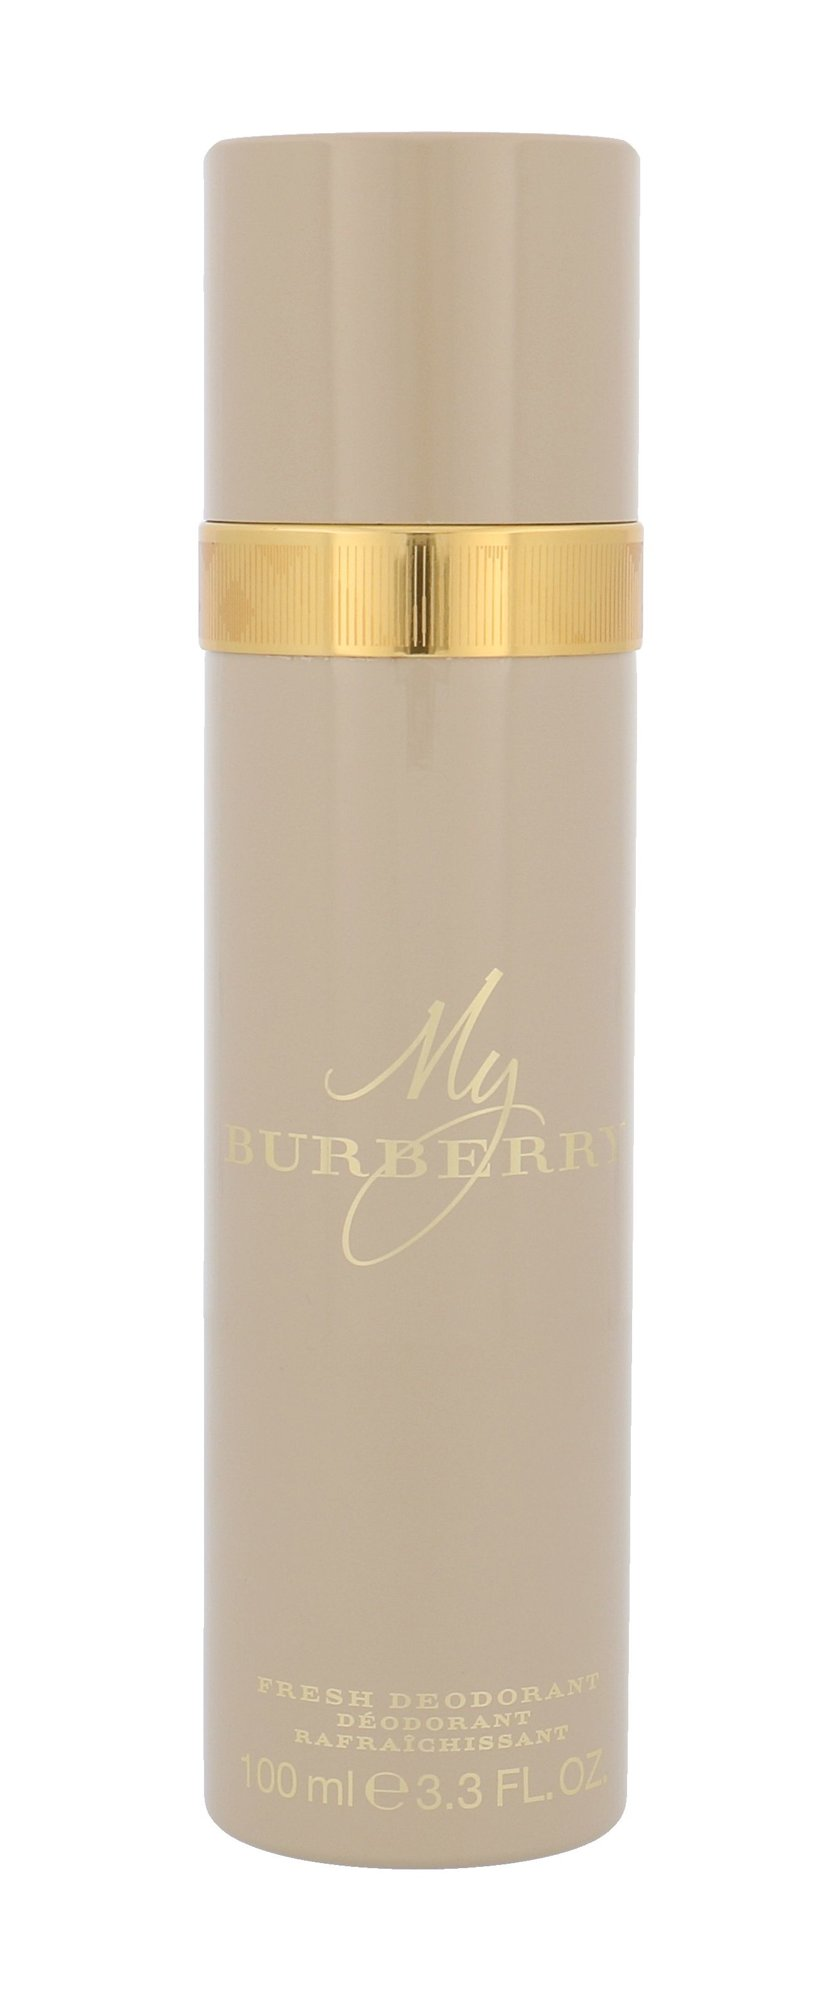 Burberry My Burberry Deodorant 100ml